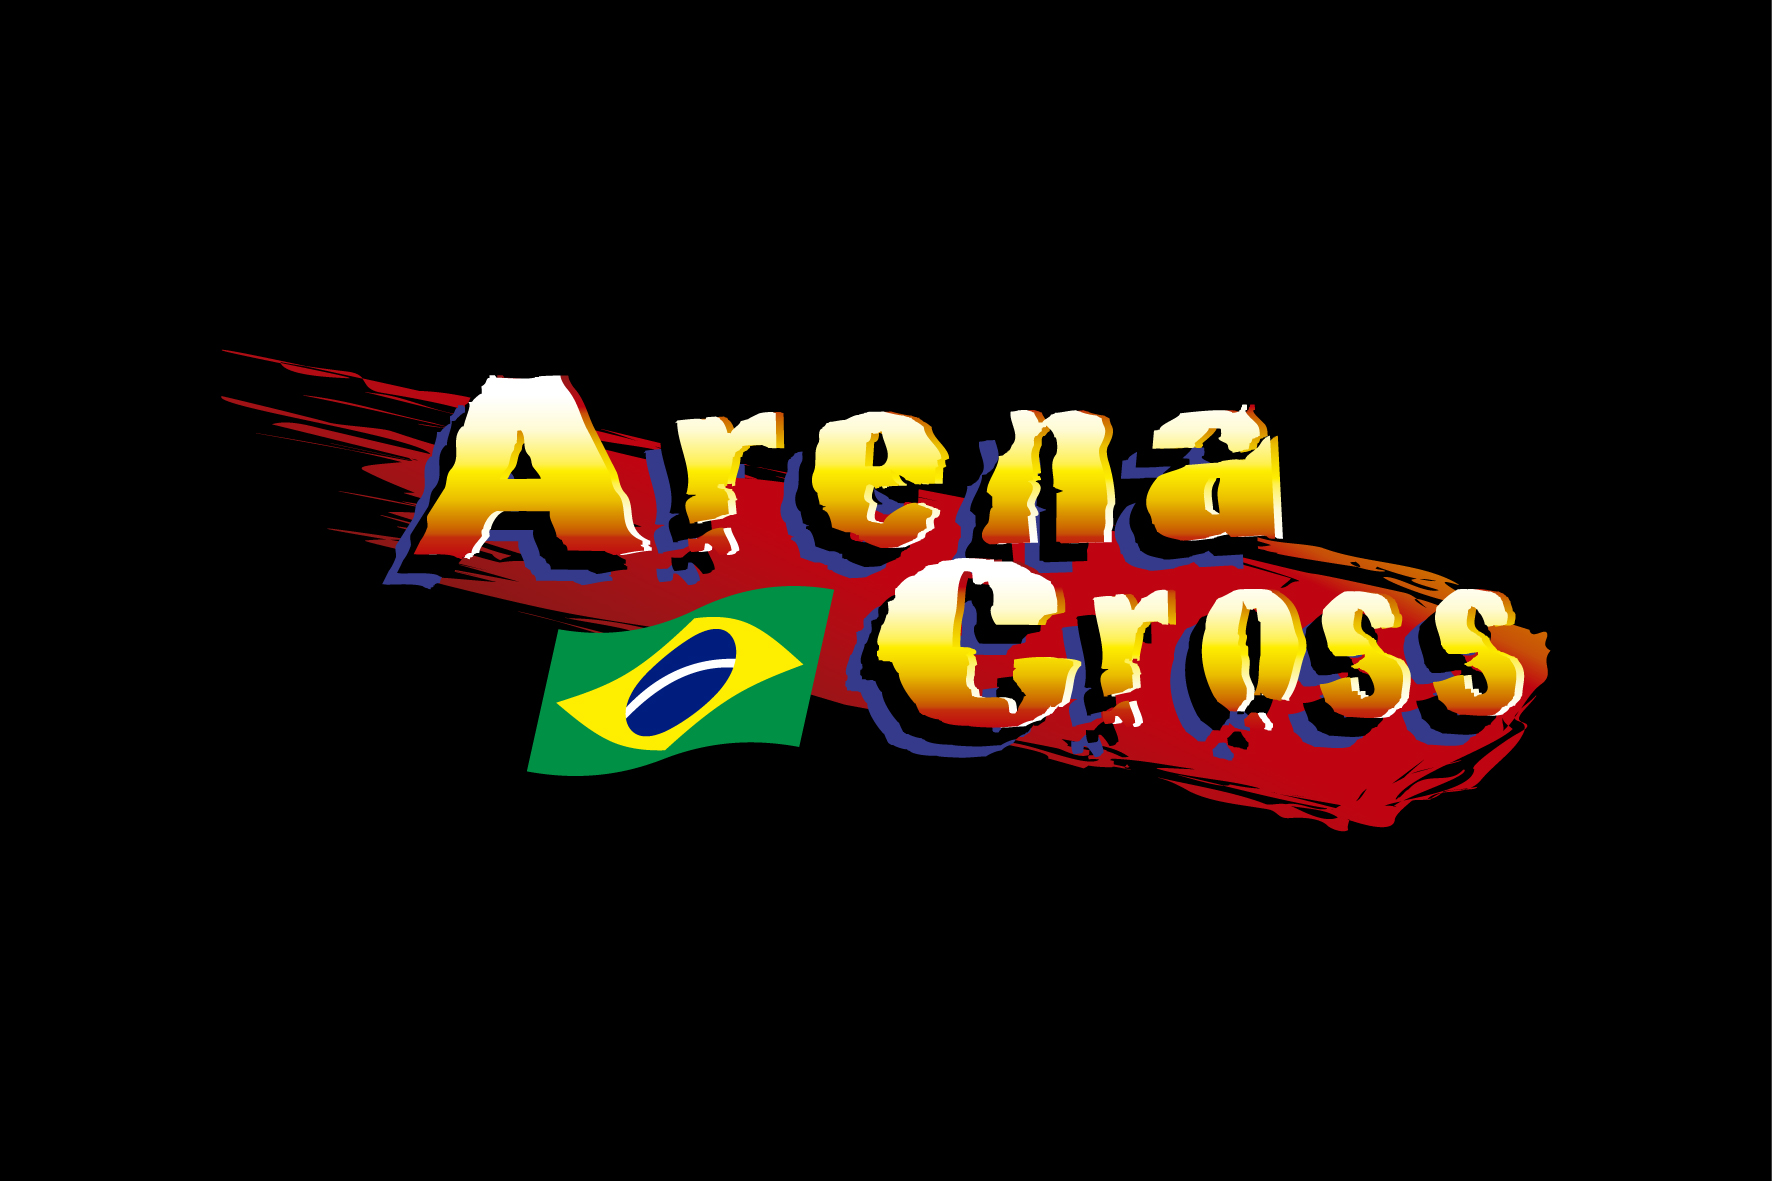 (c) Arenacross.com.br